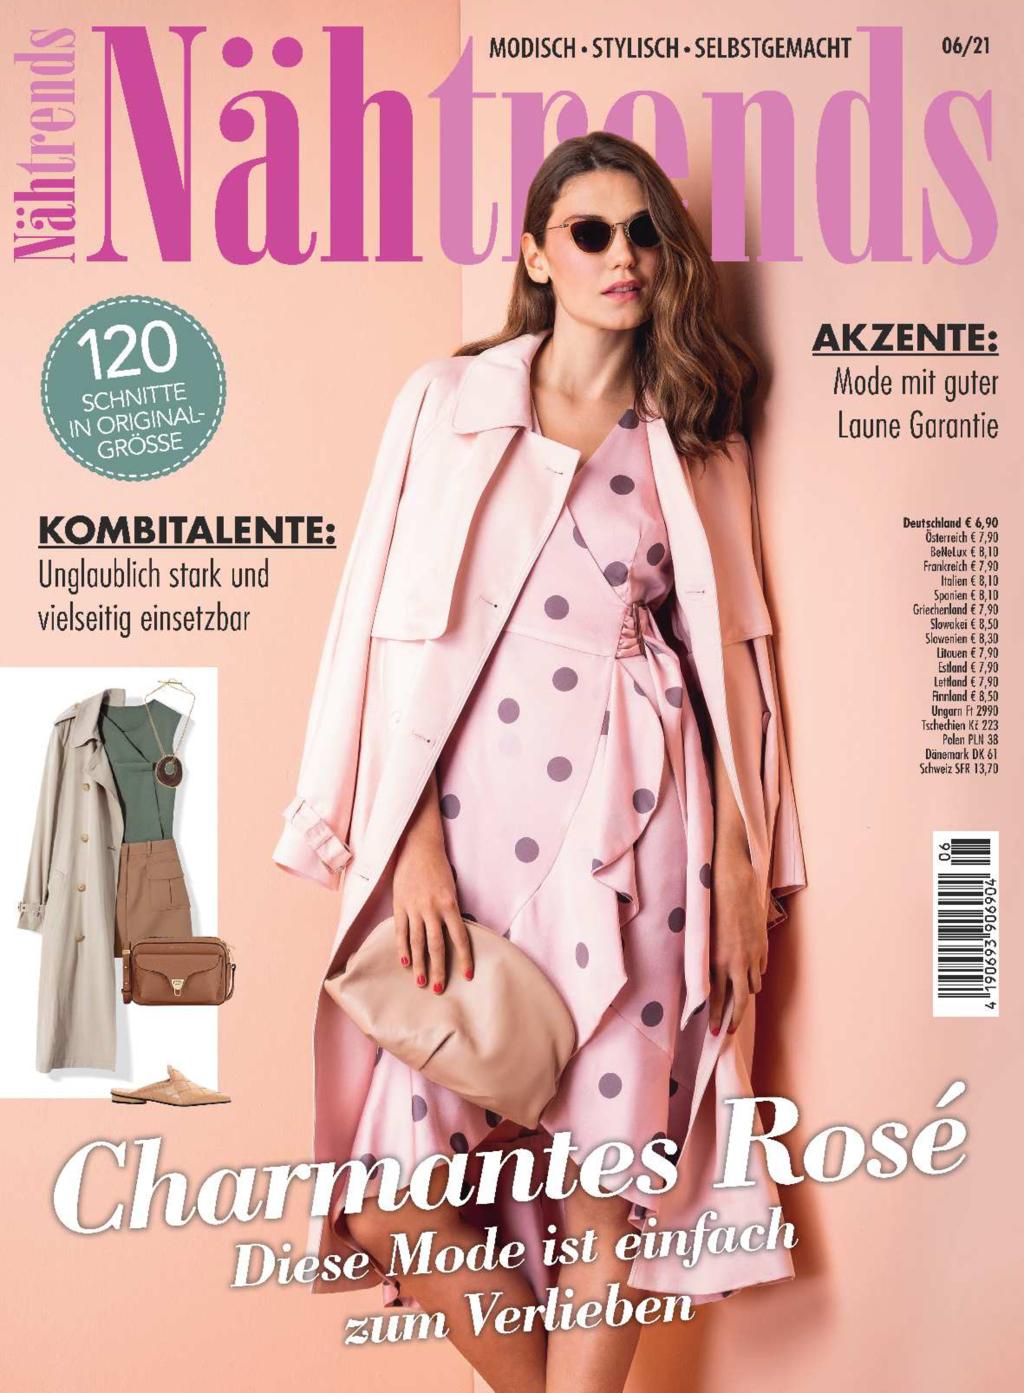 Nähtrends Nr. 06/2021 - Charmantes Rosé